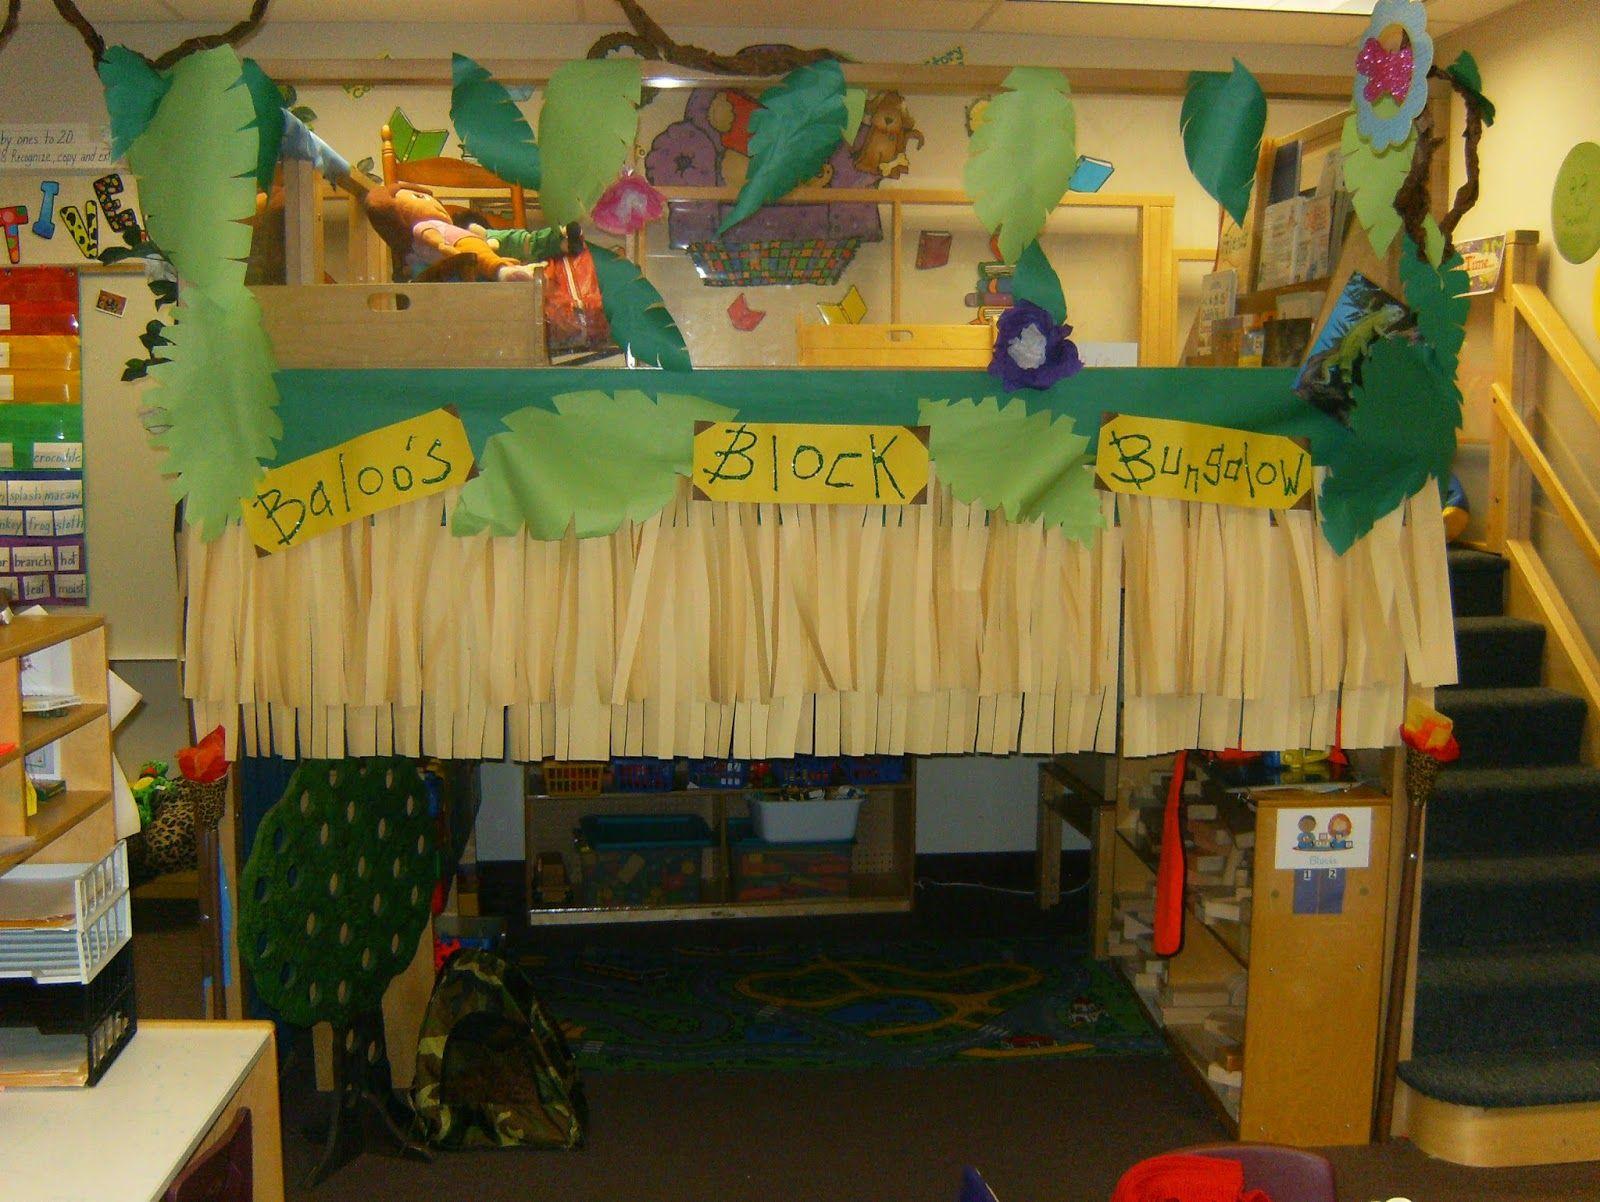 Jungle Decoration Baloos Block Bunglow Block Center Preschool Decoration Jungle